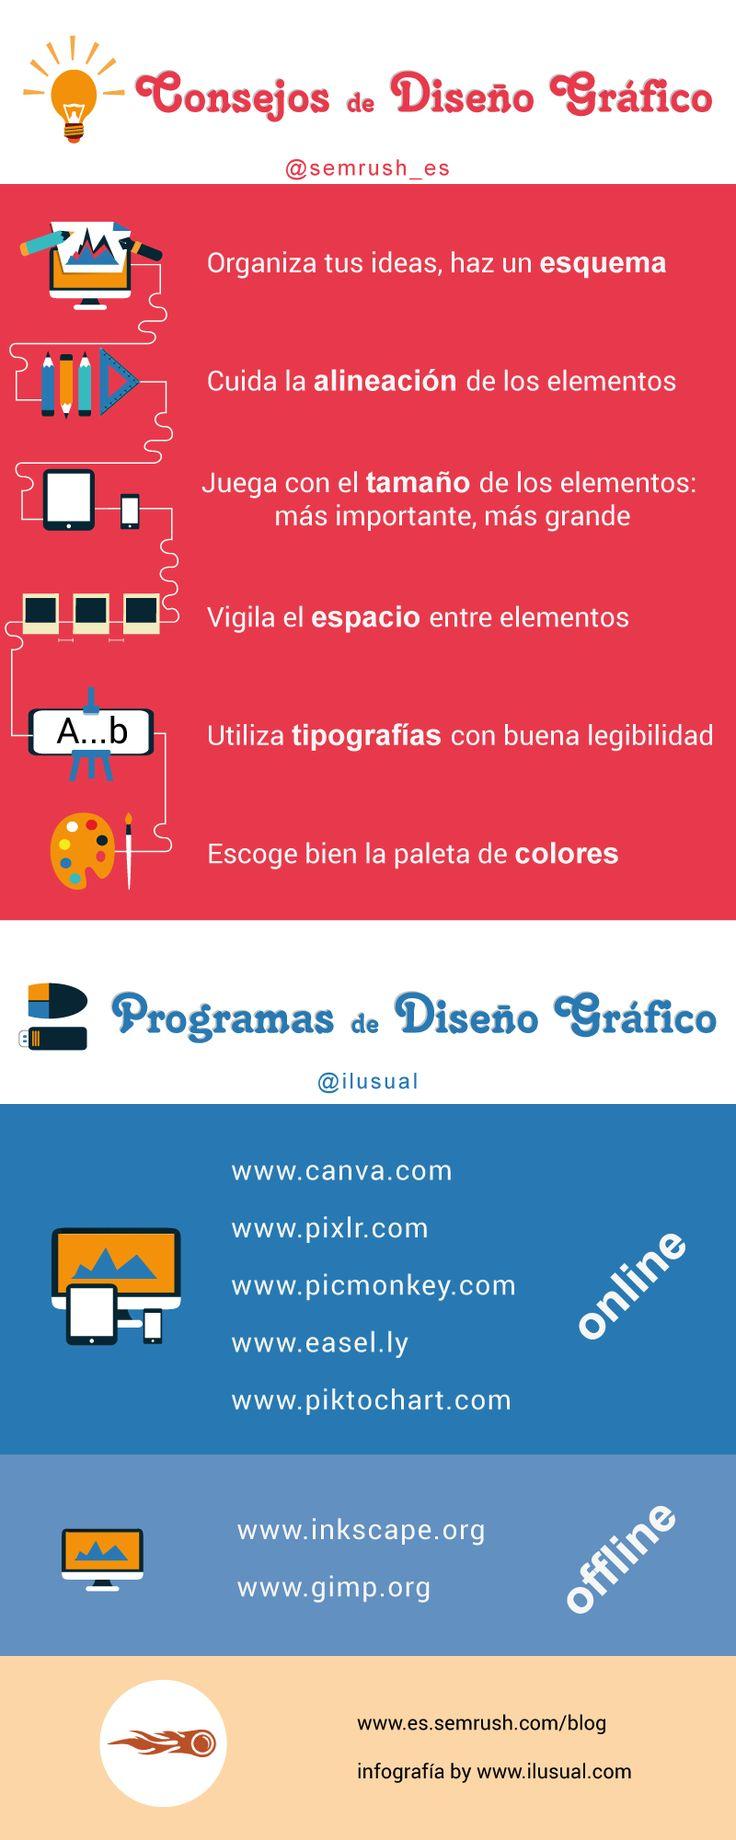 10 consejos de Diseño Gráfico #infografia #infographic #design